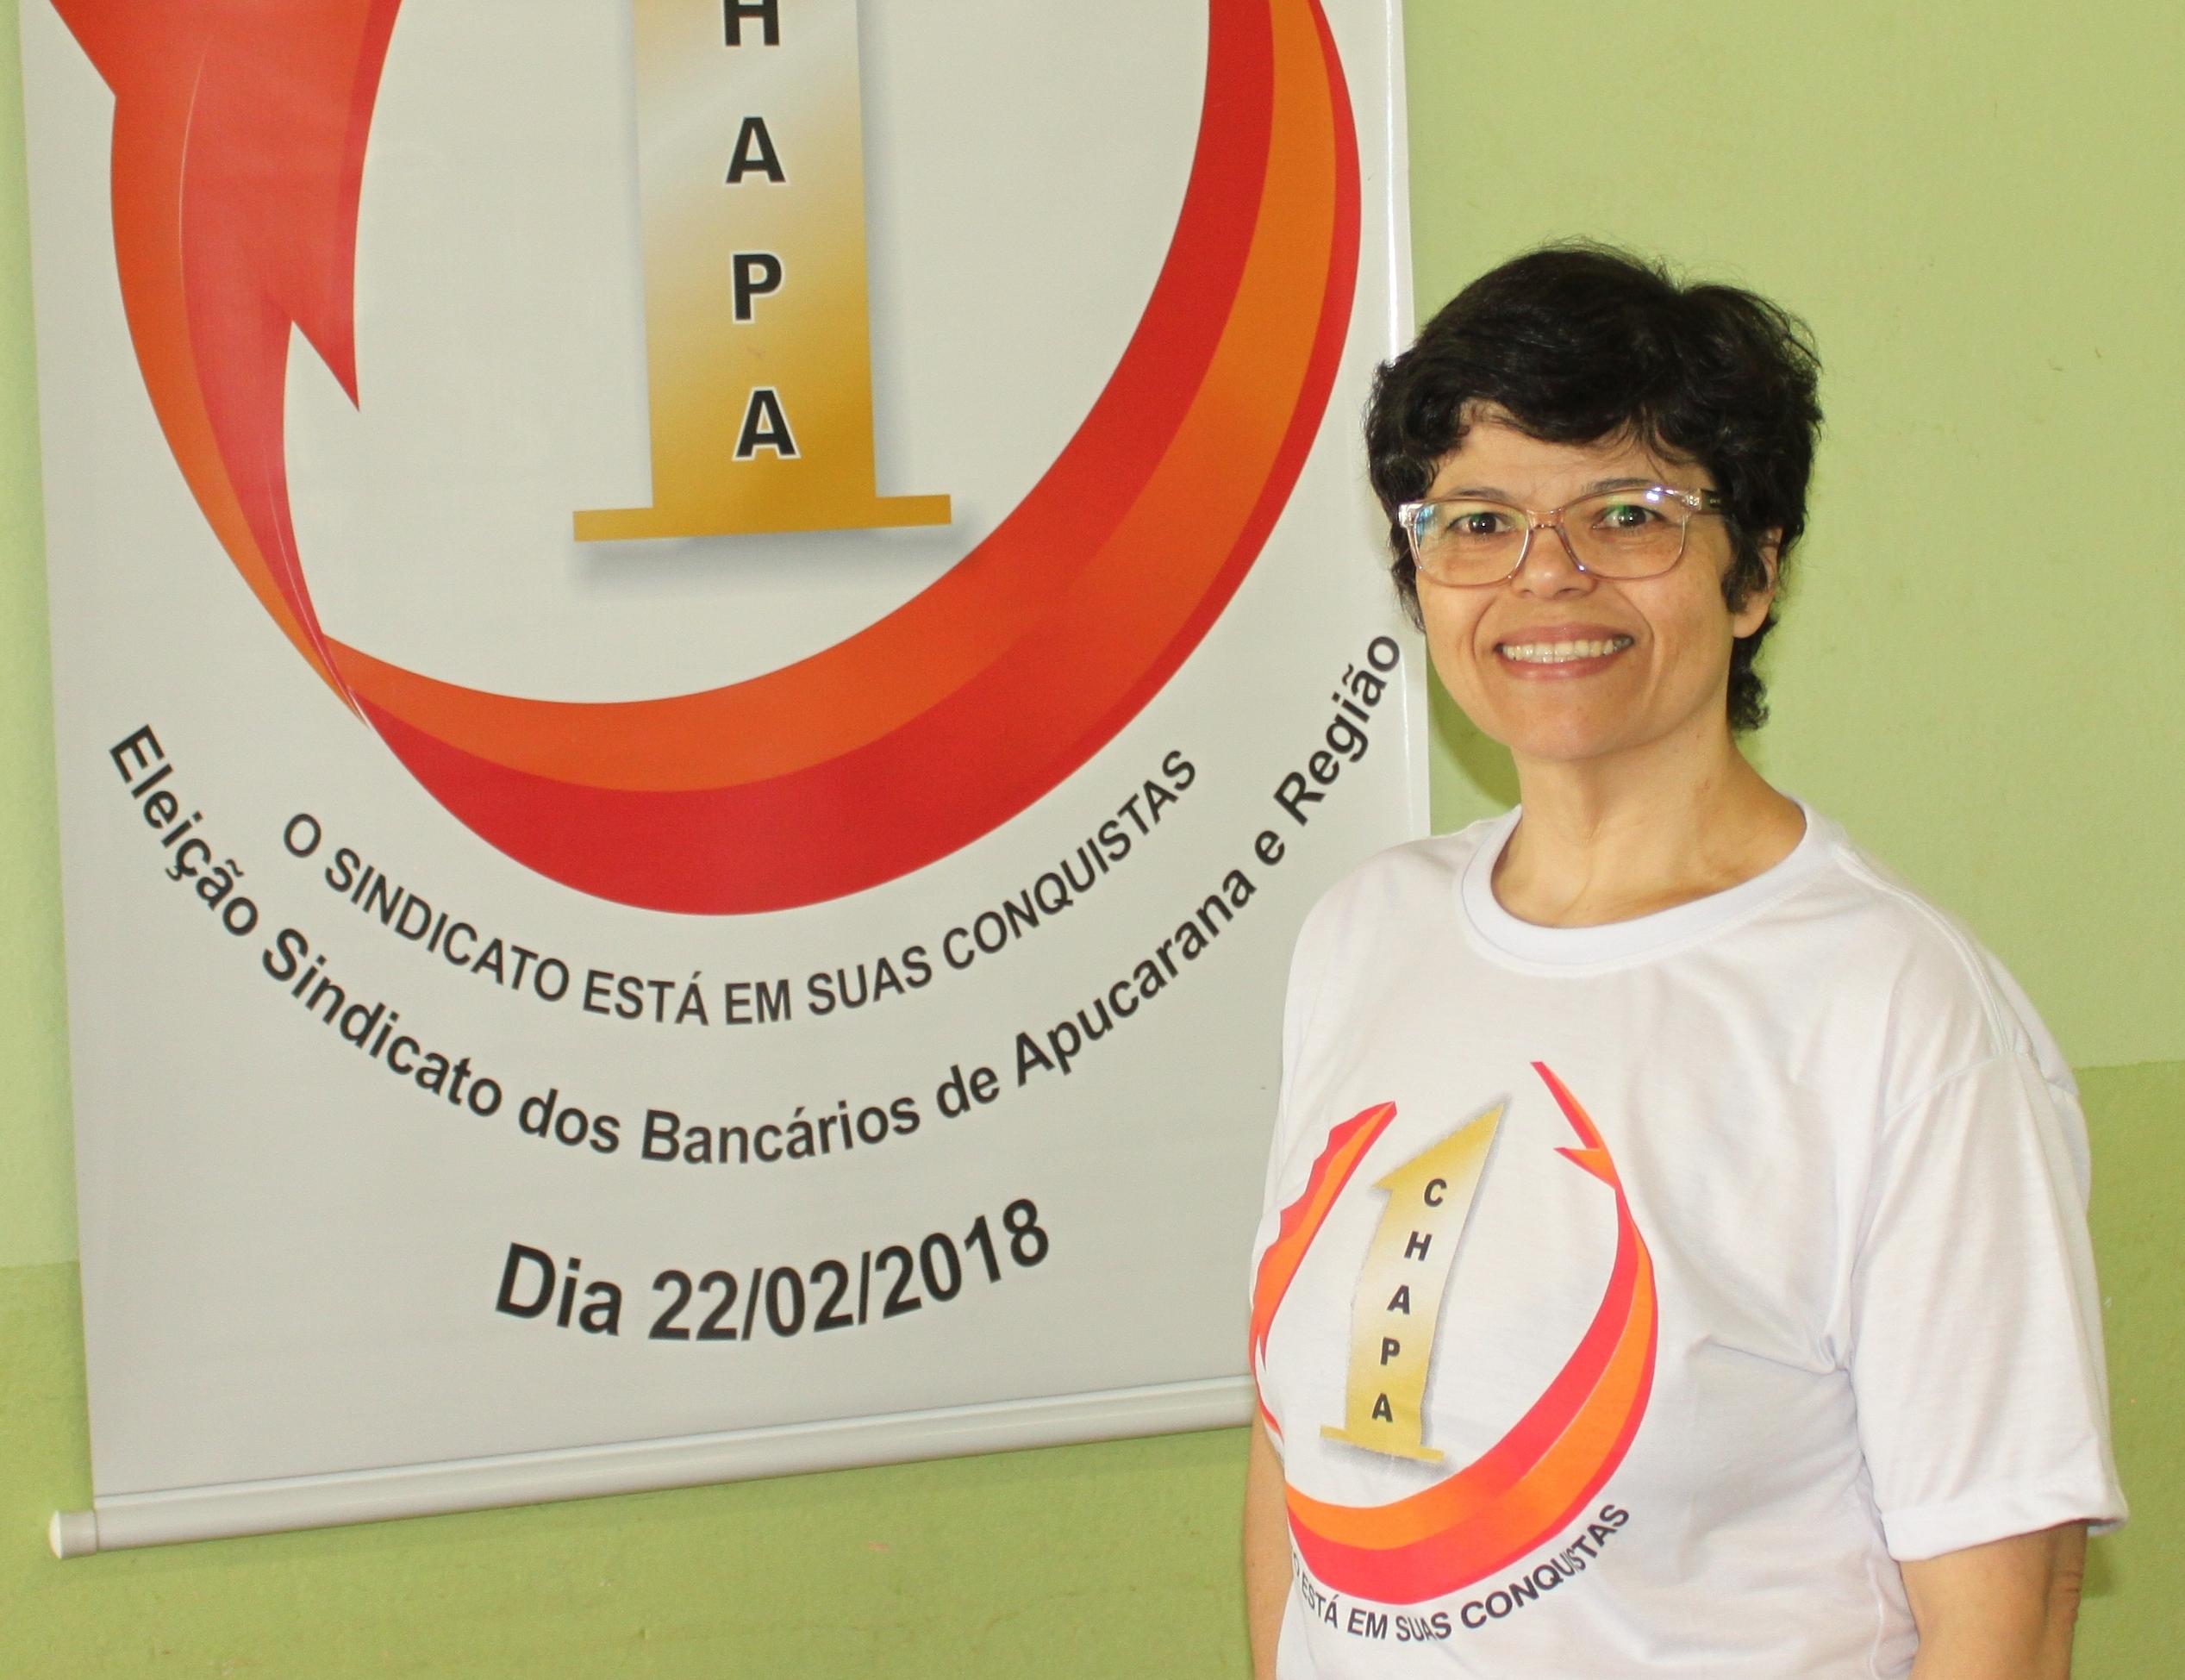 Maria de Fátima dos Santos Souza - Conselho Fiscal Efetivo BB Apucarana